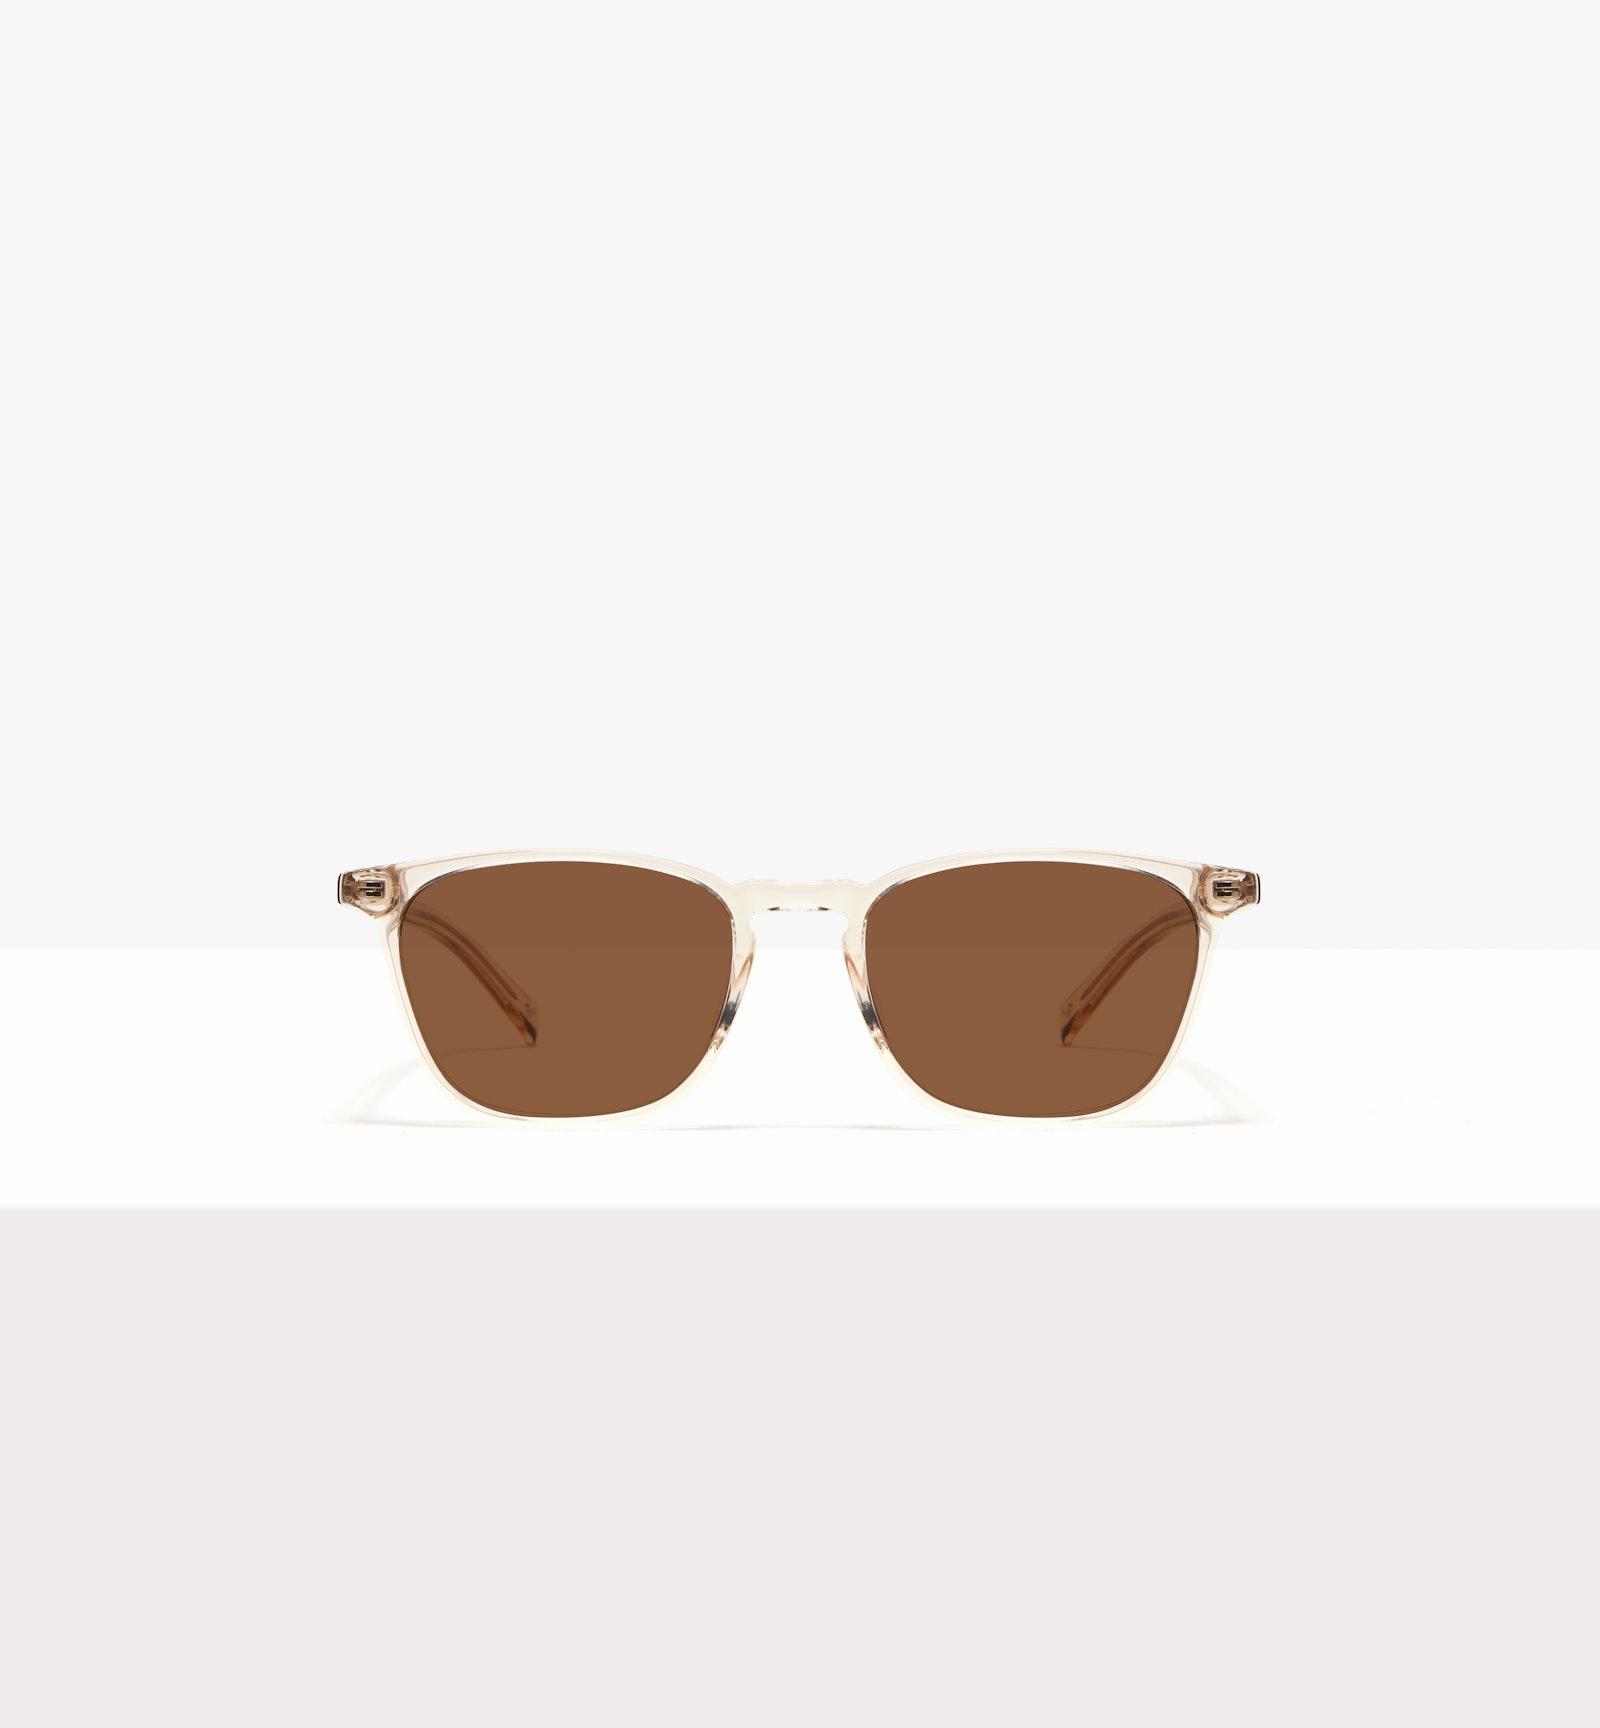 Affordable Fashion Glasses Square Sunglasses Men Louise M Clay